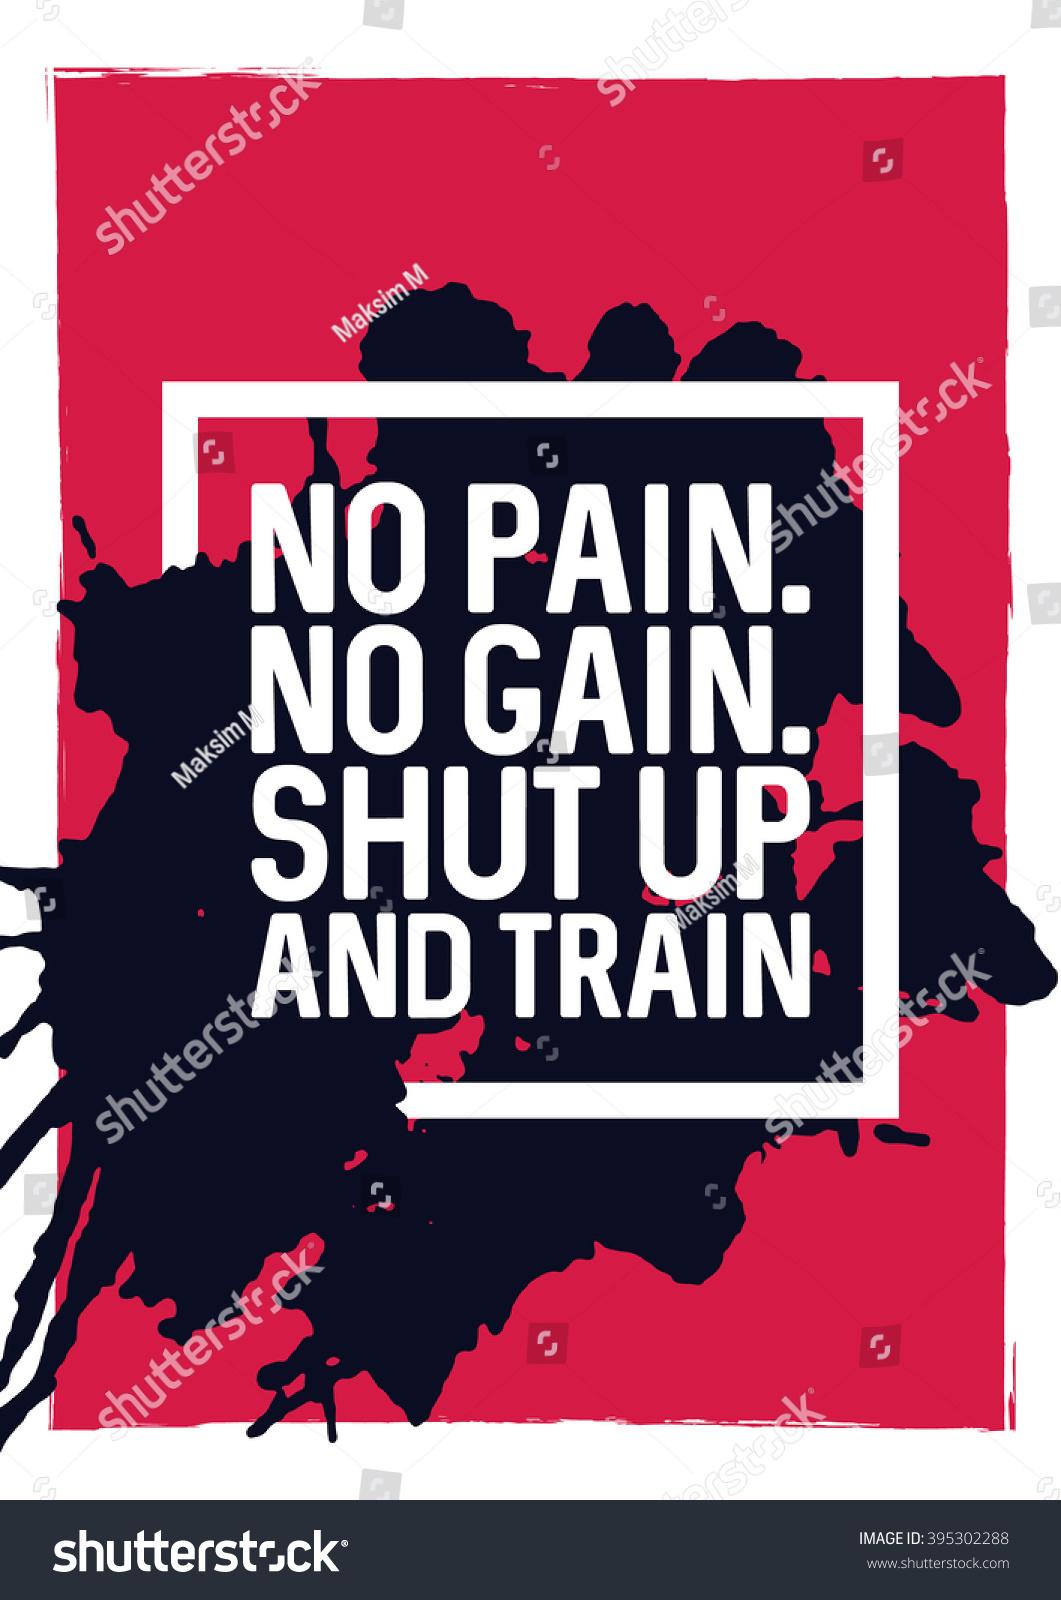 essay speech about no pain no gain No pain no gain essay in hindi no pain no gain speech in hindi| essay on no pain no gain for class 10 in hindi| no pain no gain explanation in hindi.